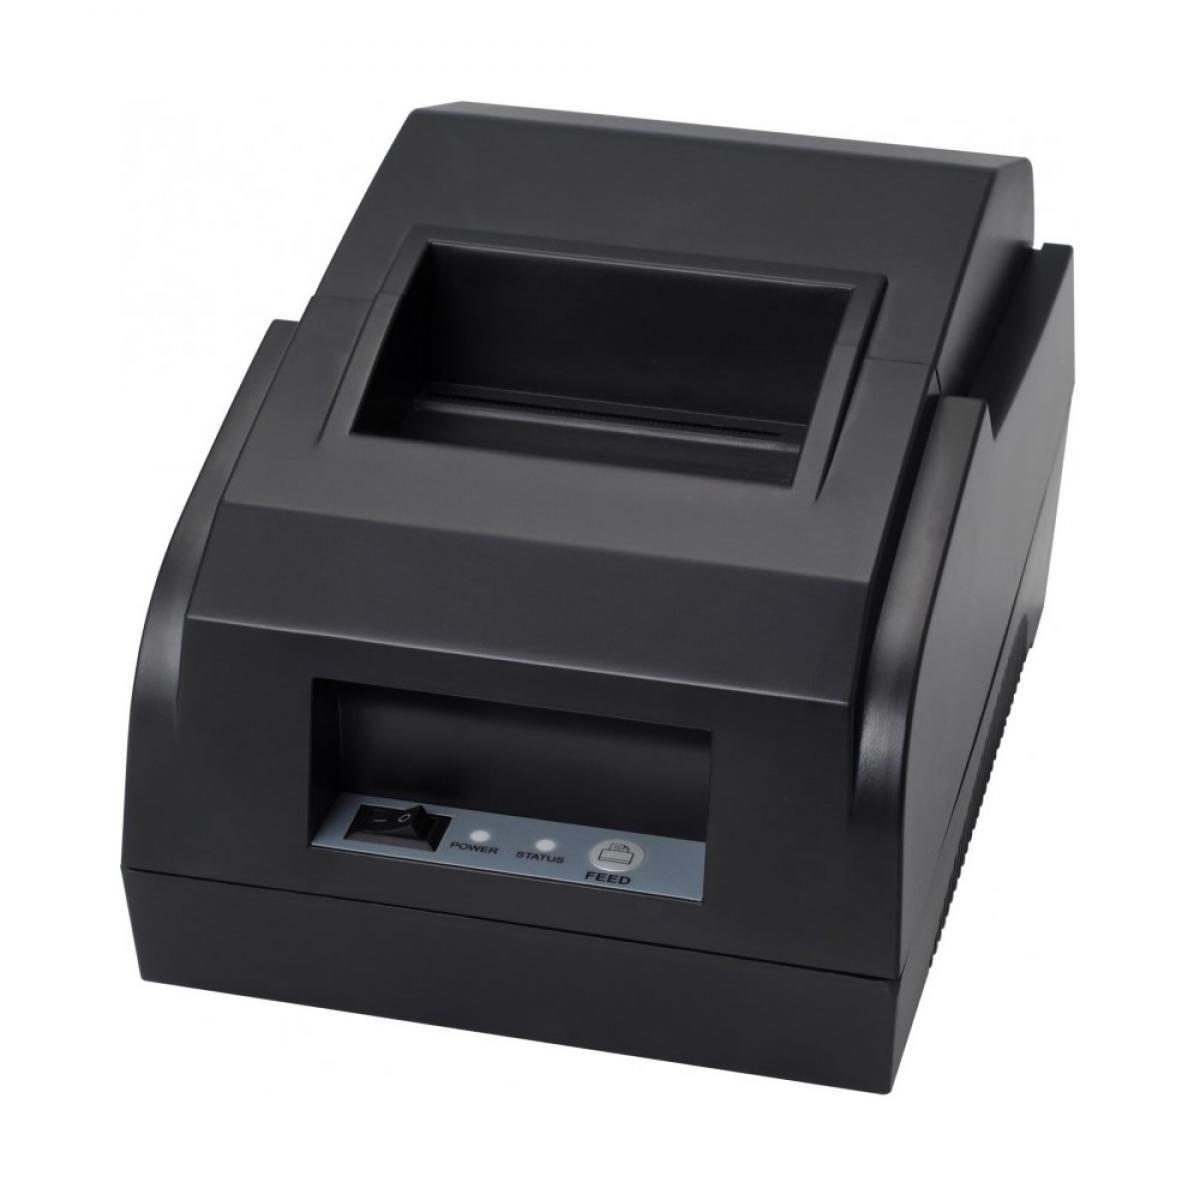 Impresora Ticket Térmica ITP-58: Amazon.es: Informática